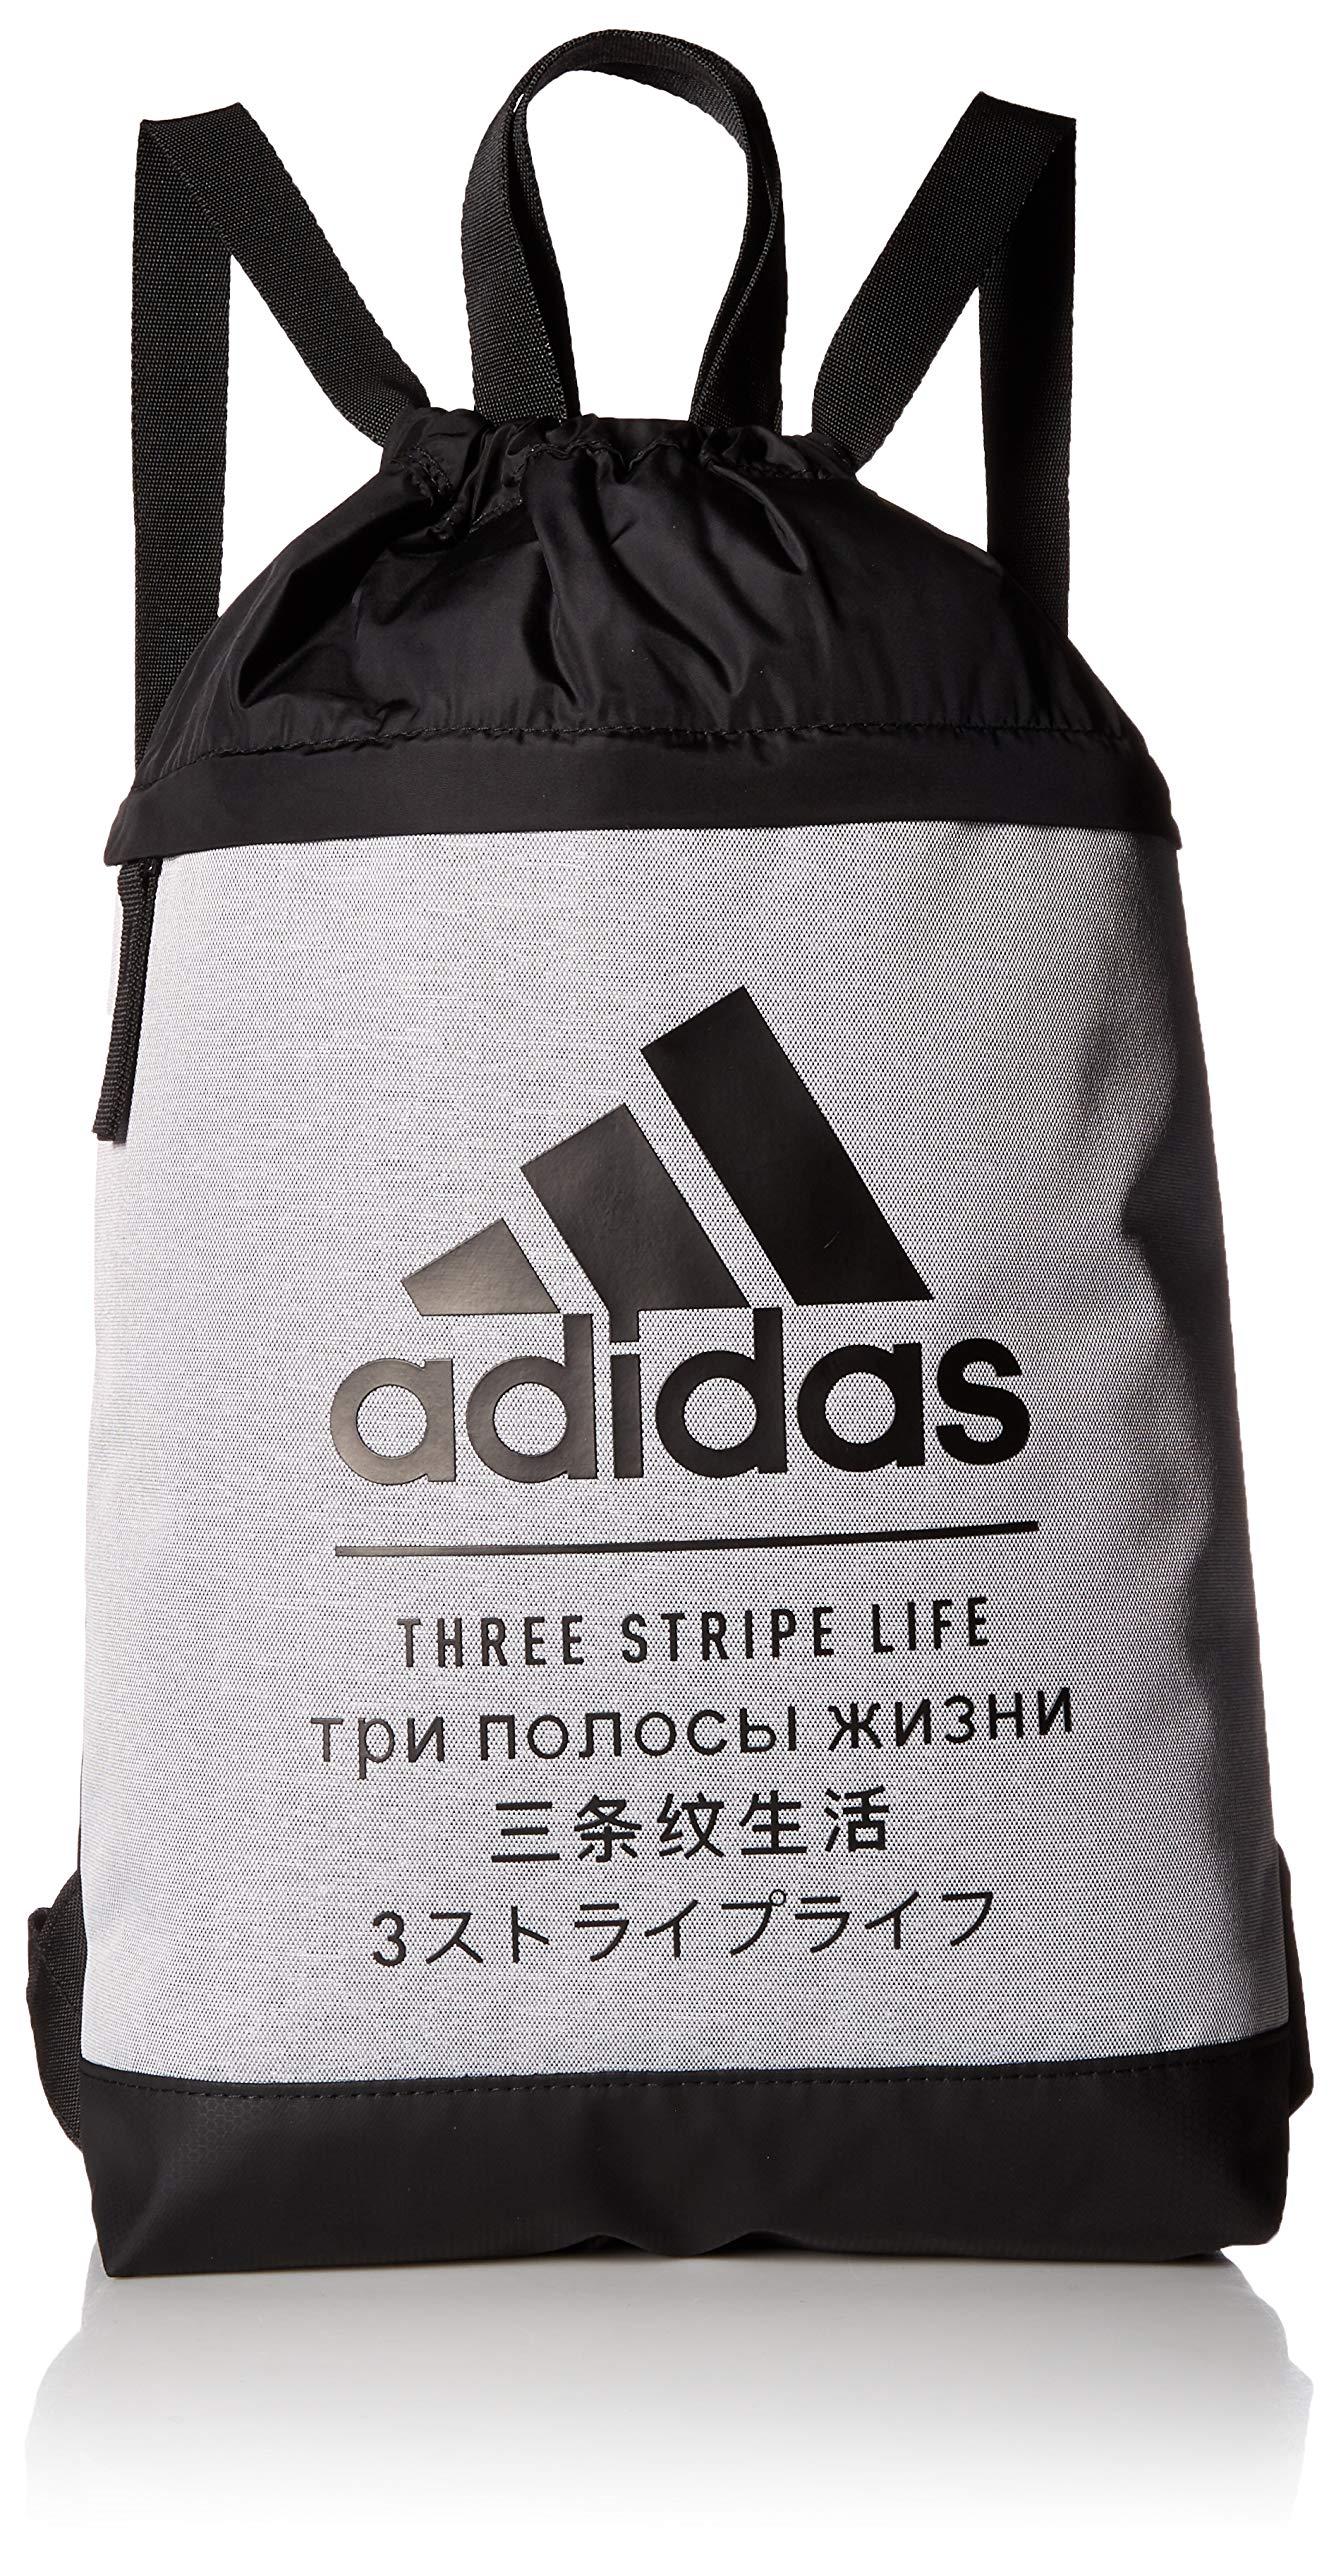 adidas Amplifier Blocked Sackpack, CD. Grey/Black, One Size